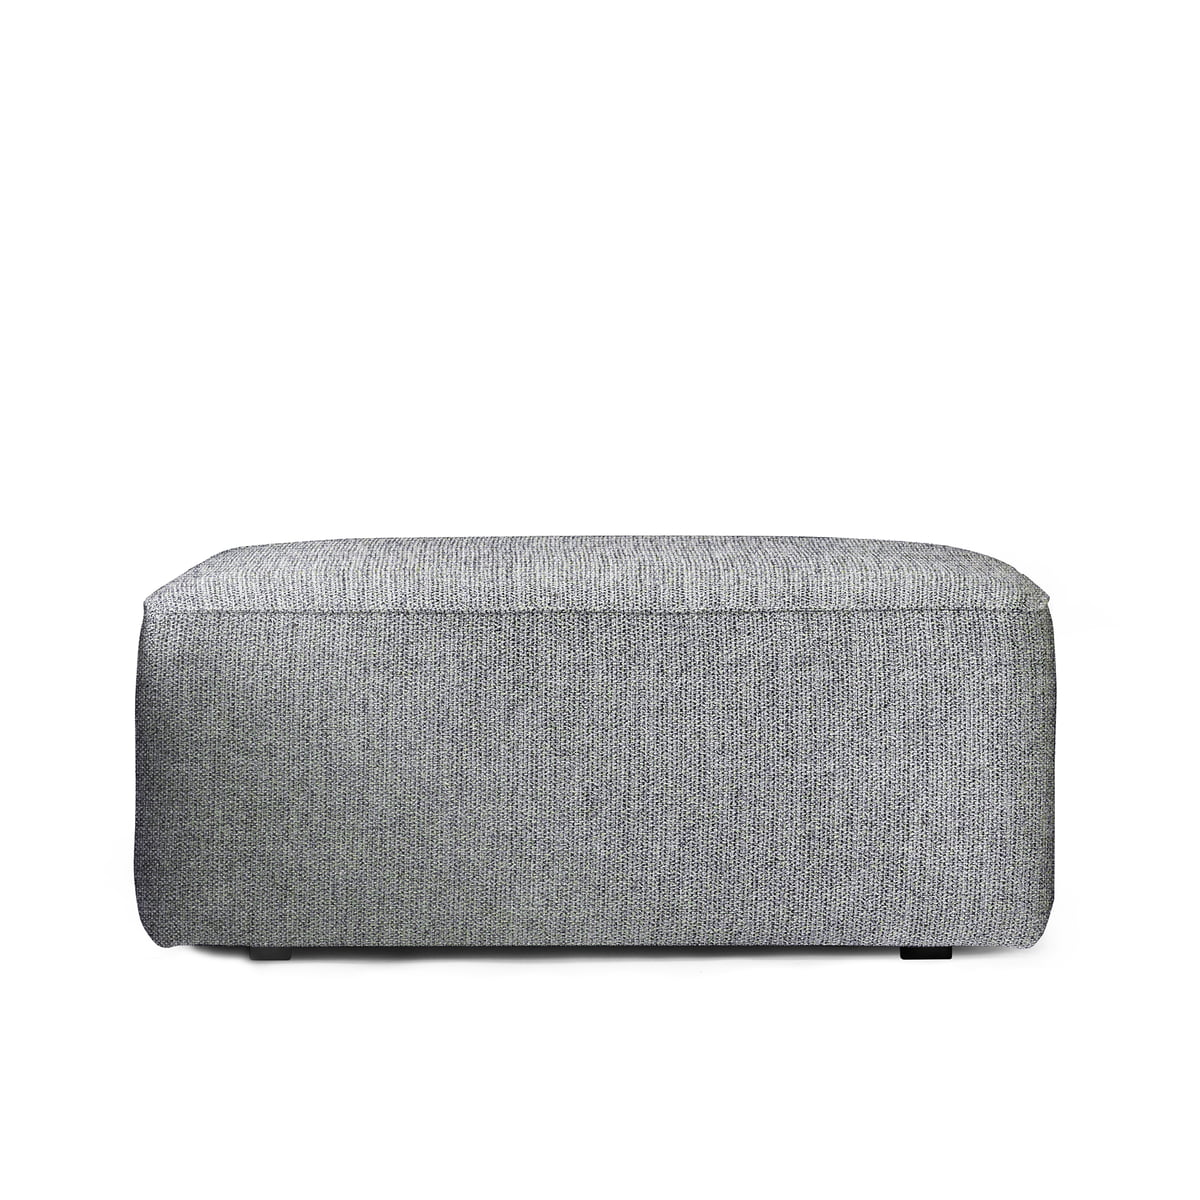 The Menu Eave Modular Sofa Pouf In Light Grey Hallingdal 130